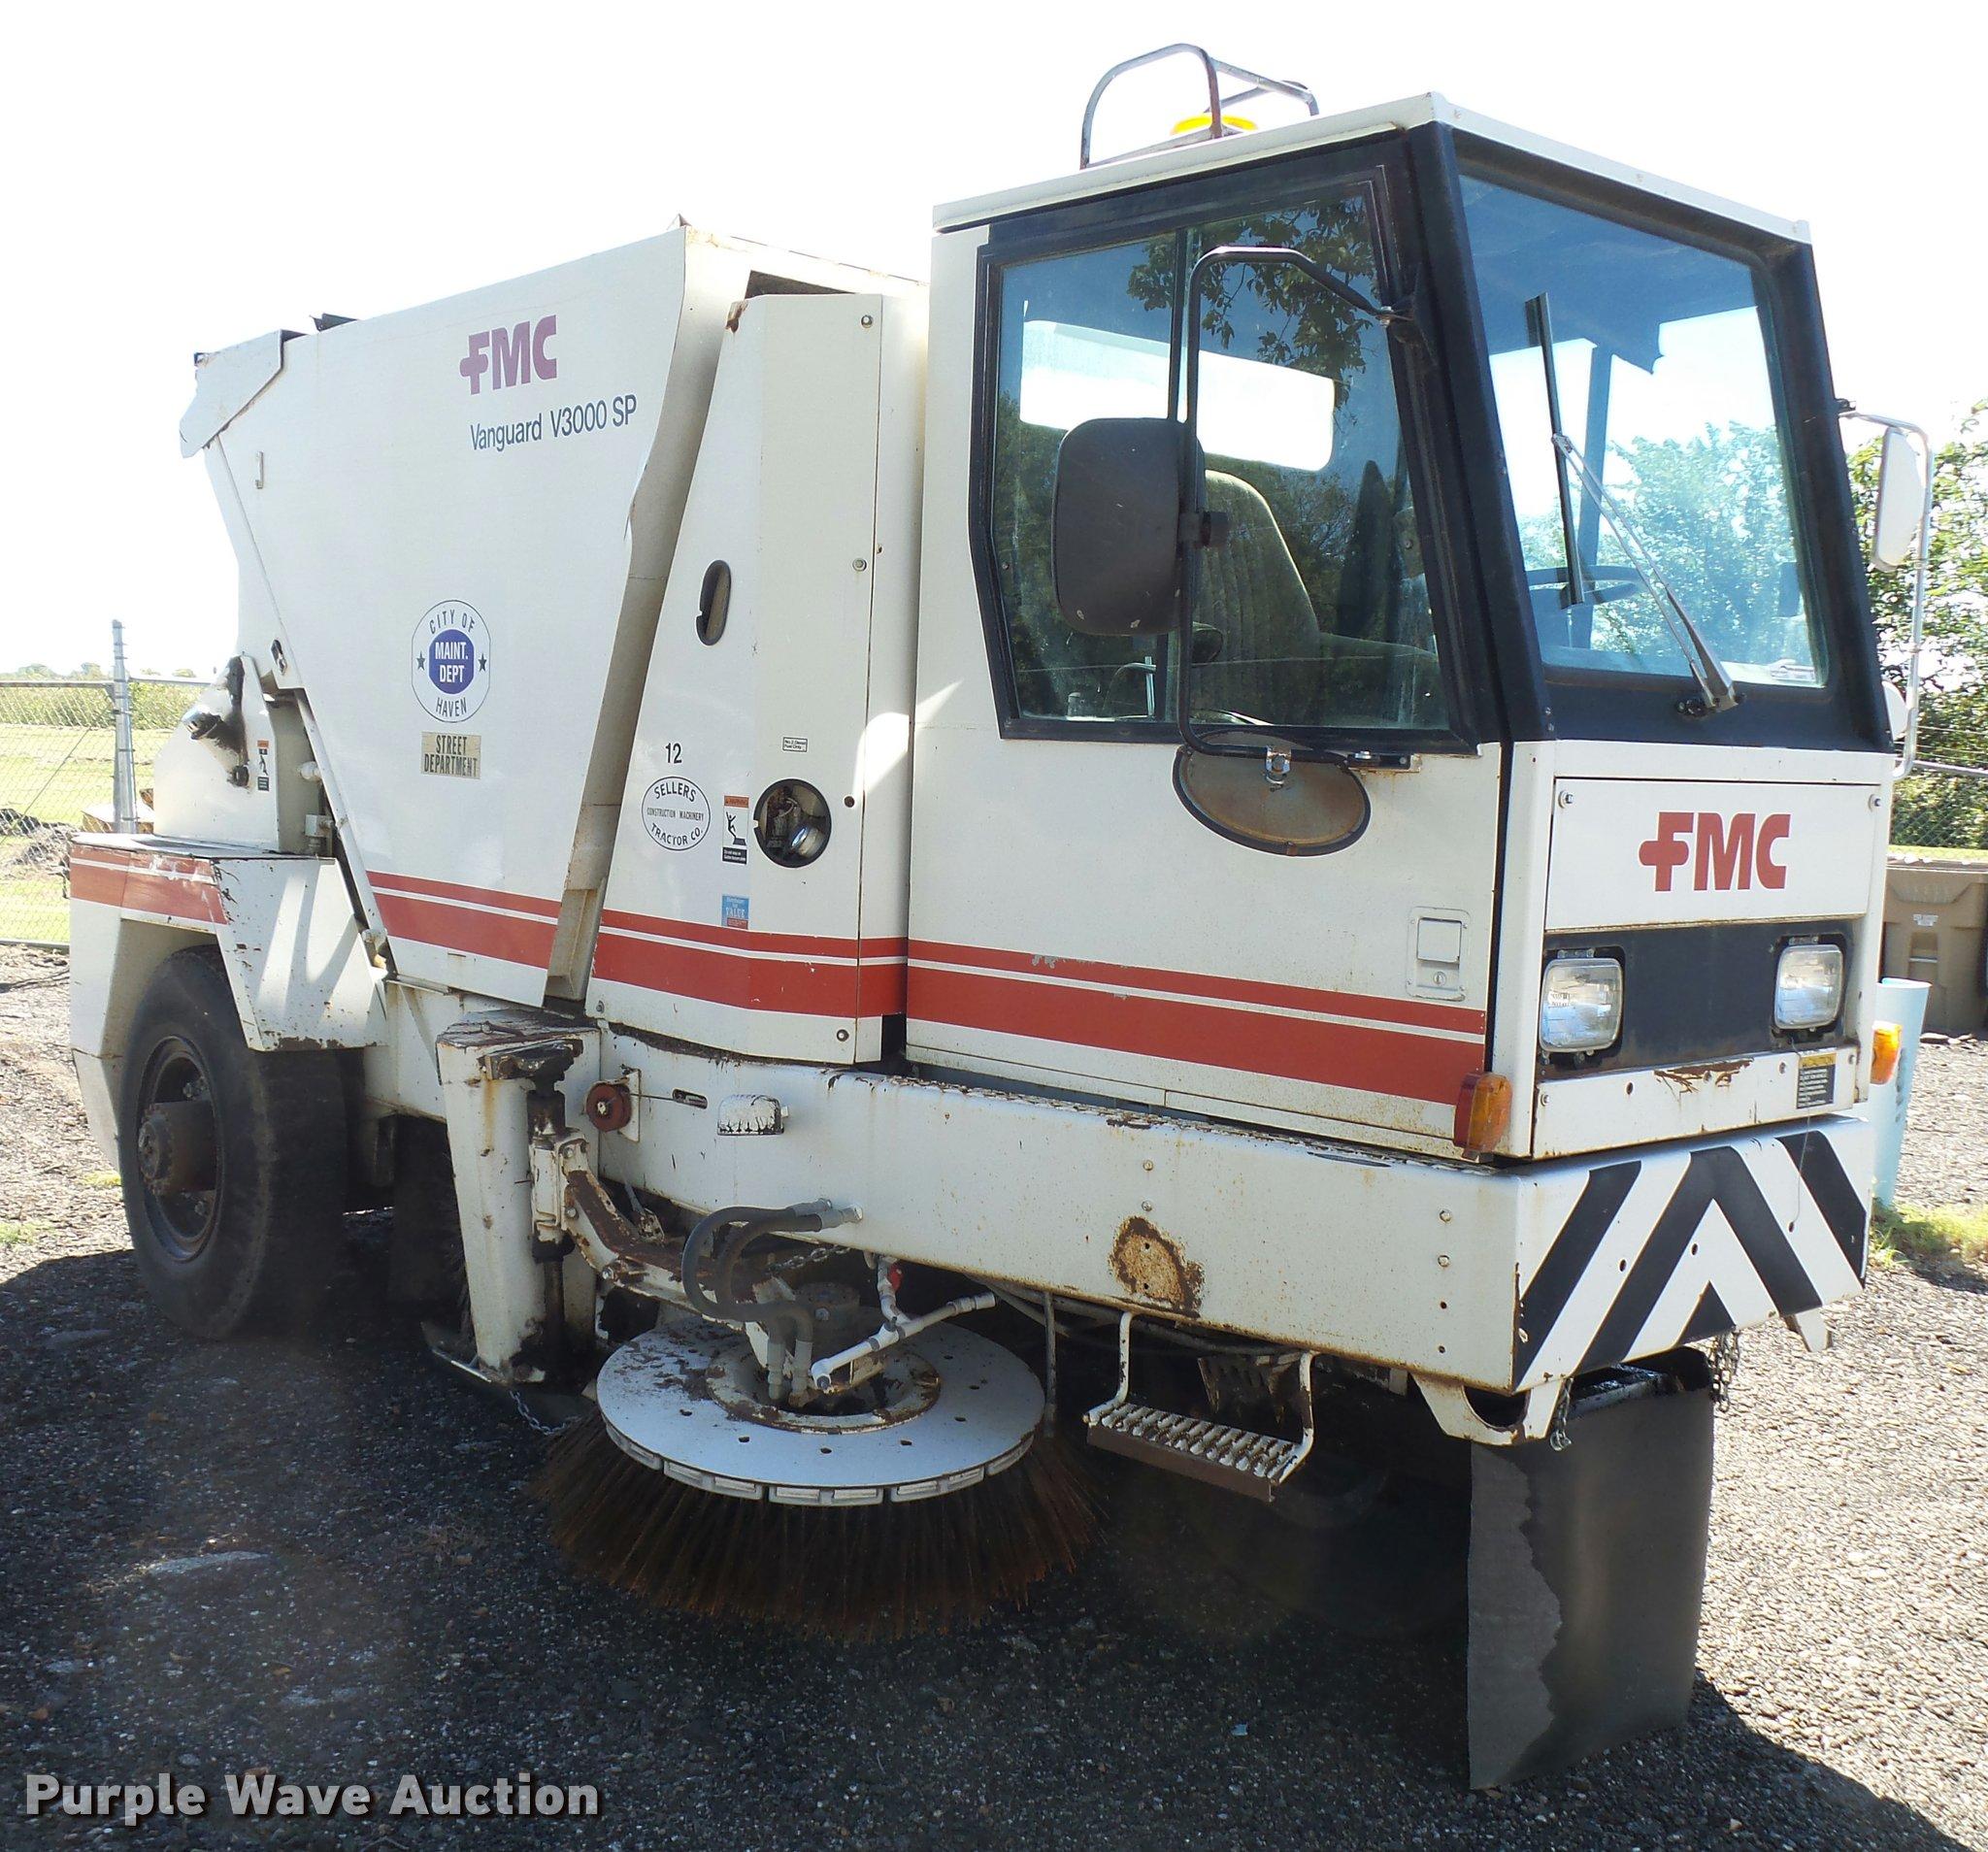 1989 fmc vanguard v3000sp street sweeper item da9815 sol rh purplewave com FMC Motorhome Vanguard Truck Street Sweeper